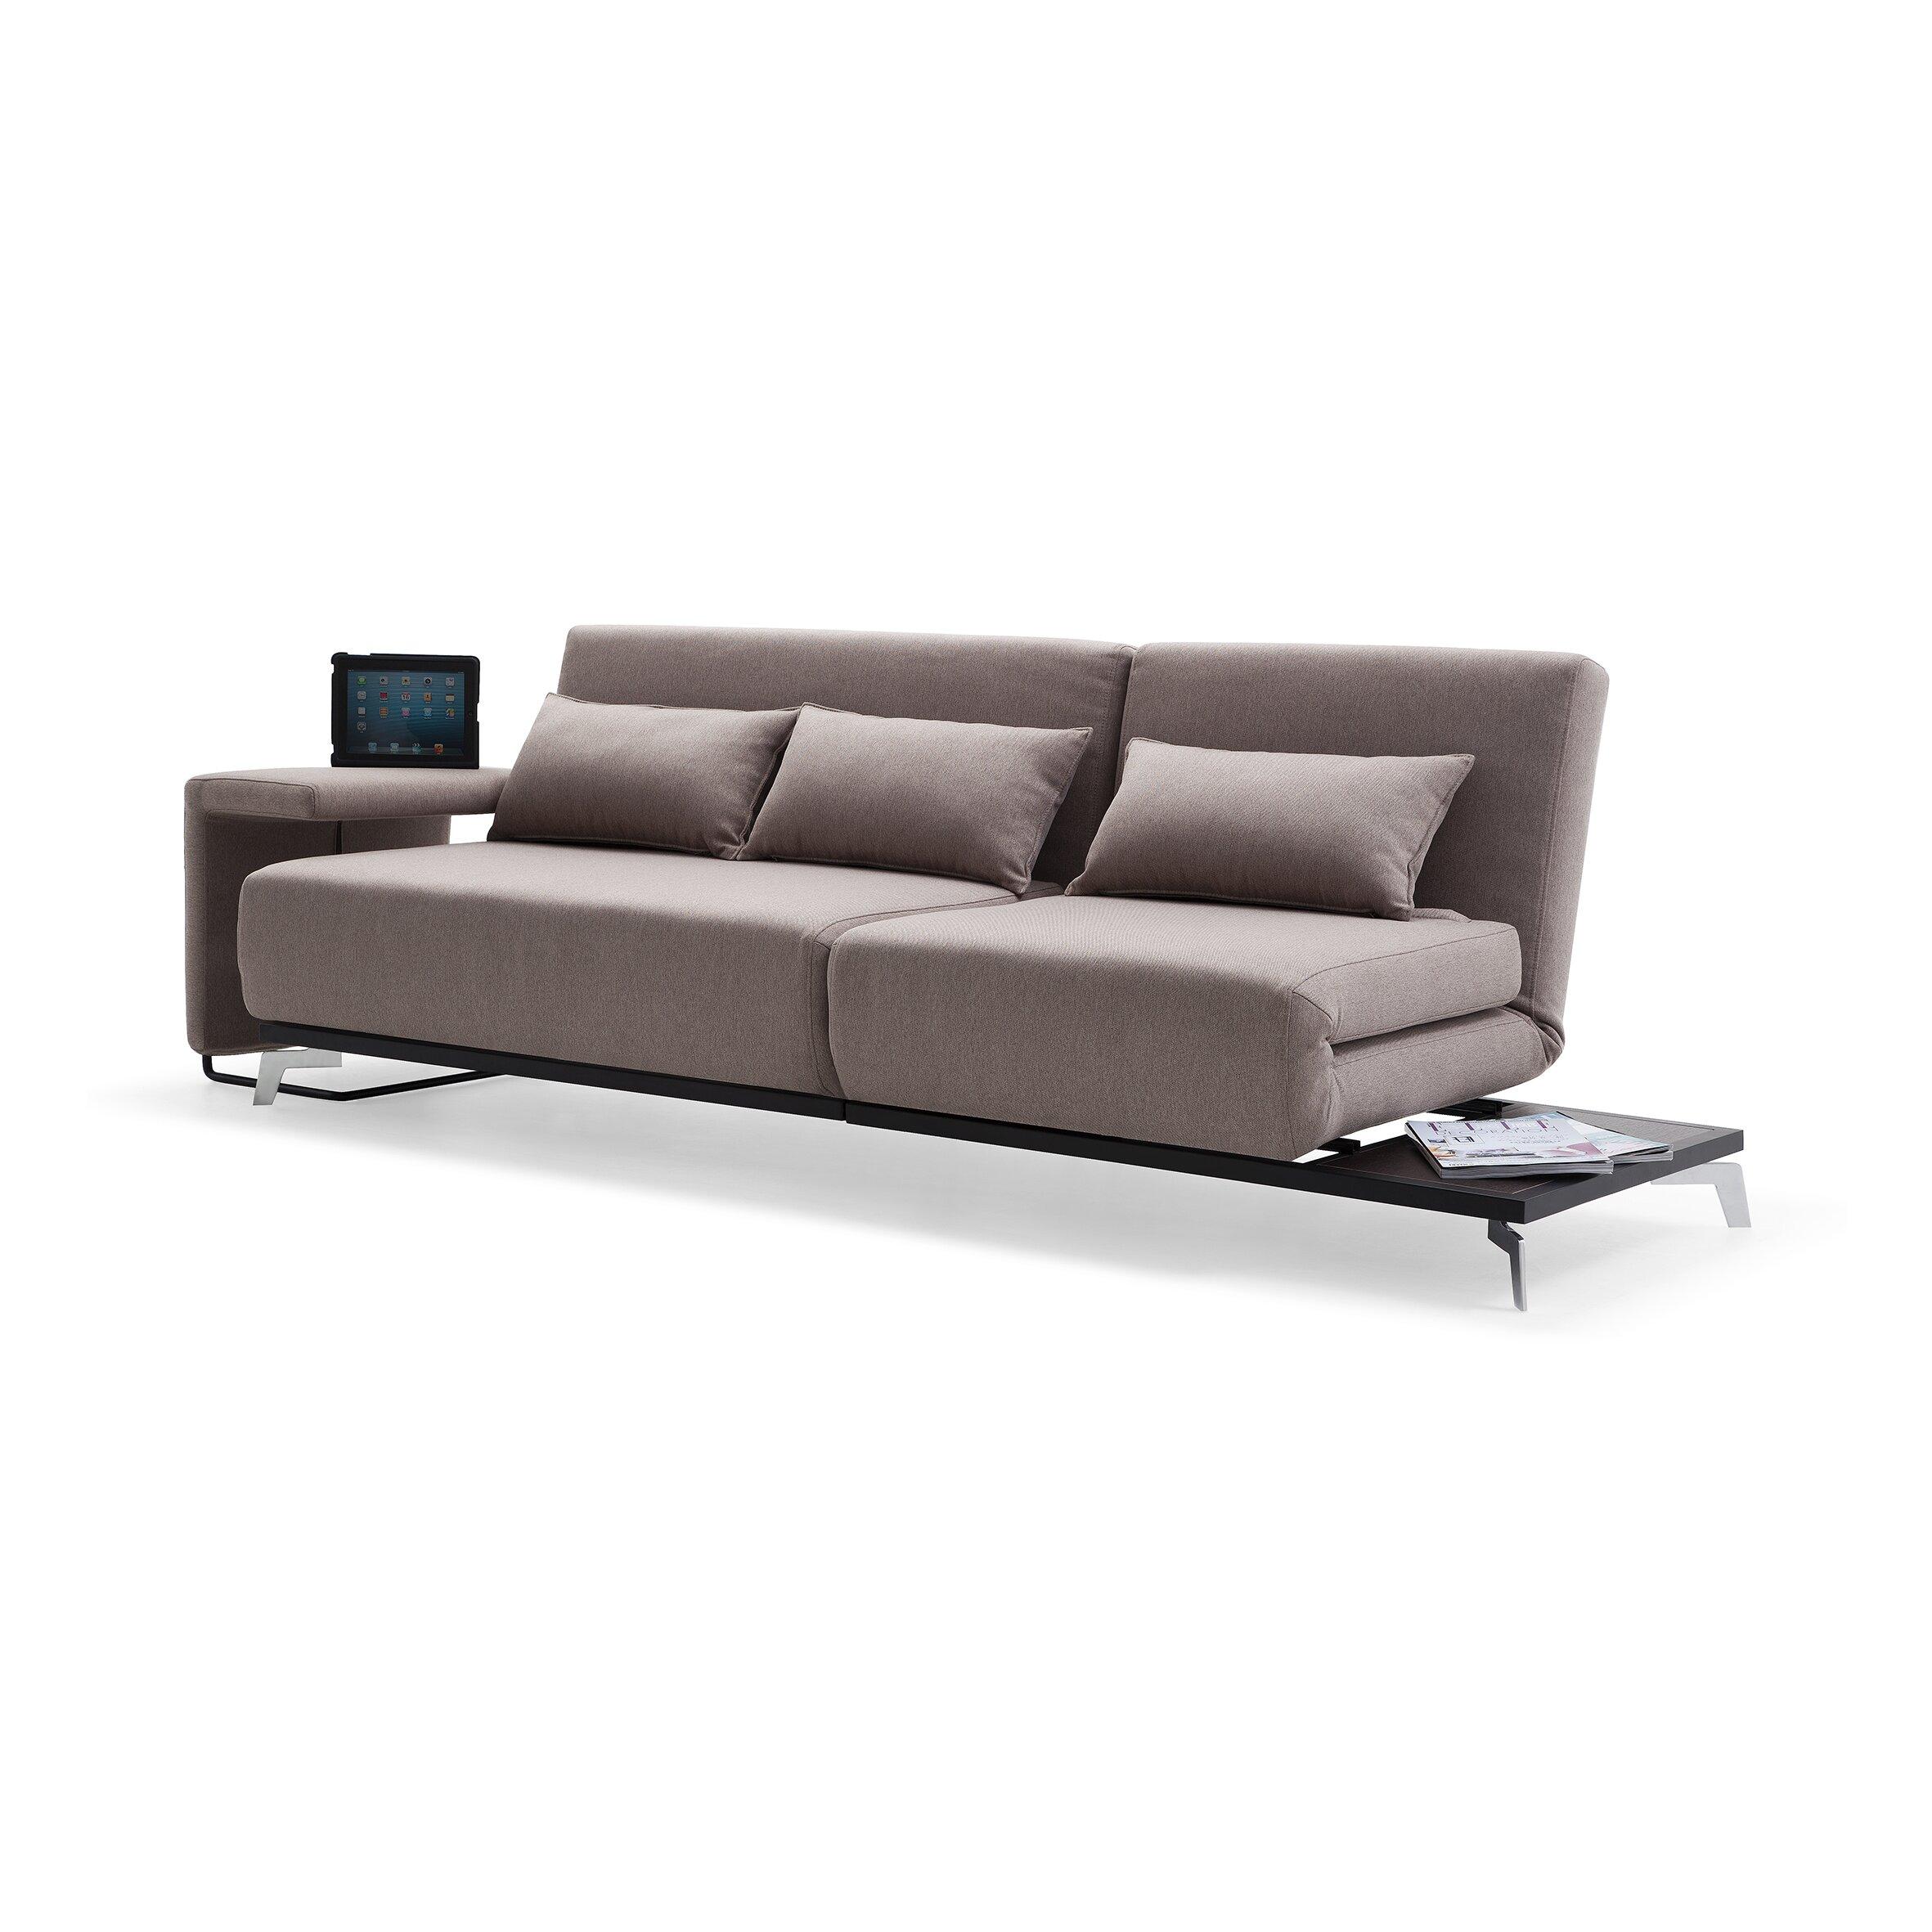 Modular Sleeper Sofa hmmi